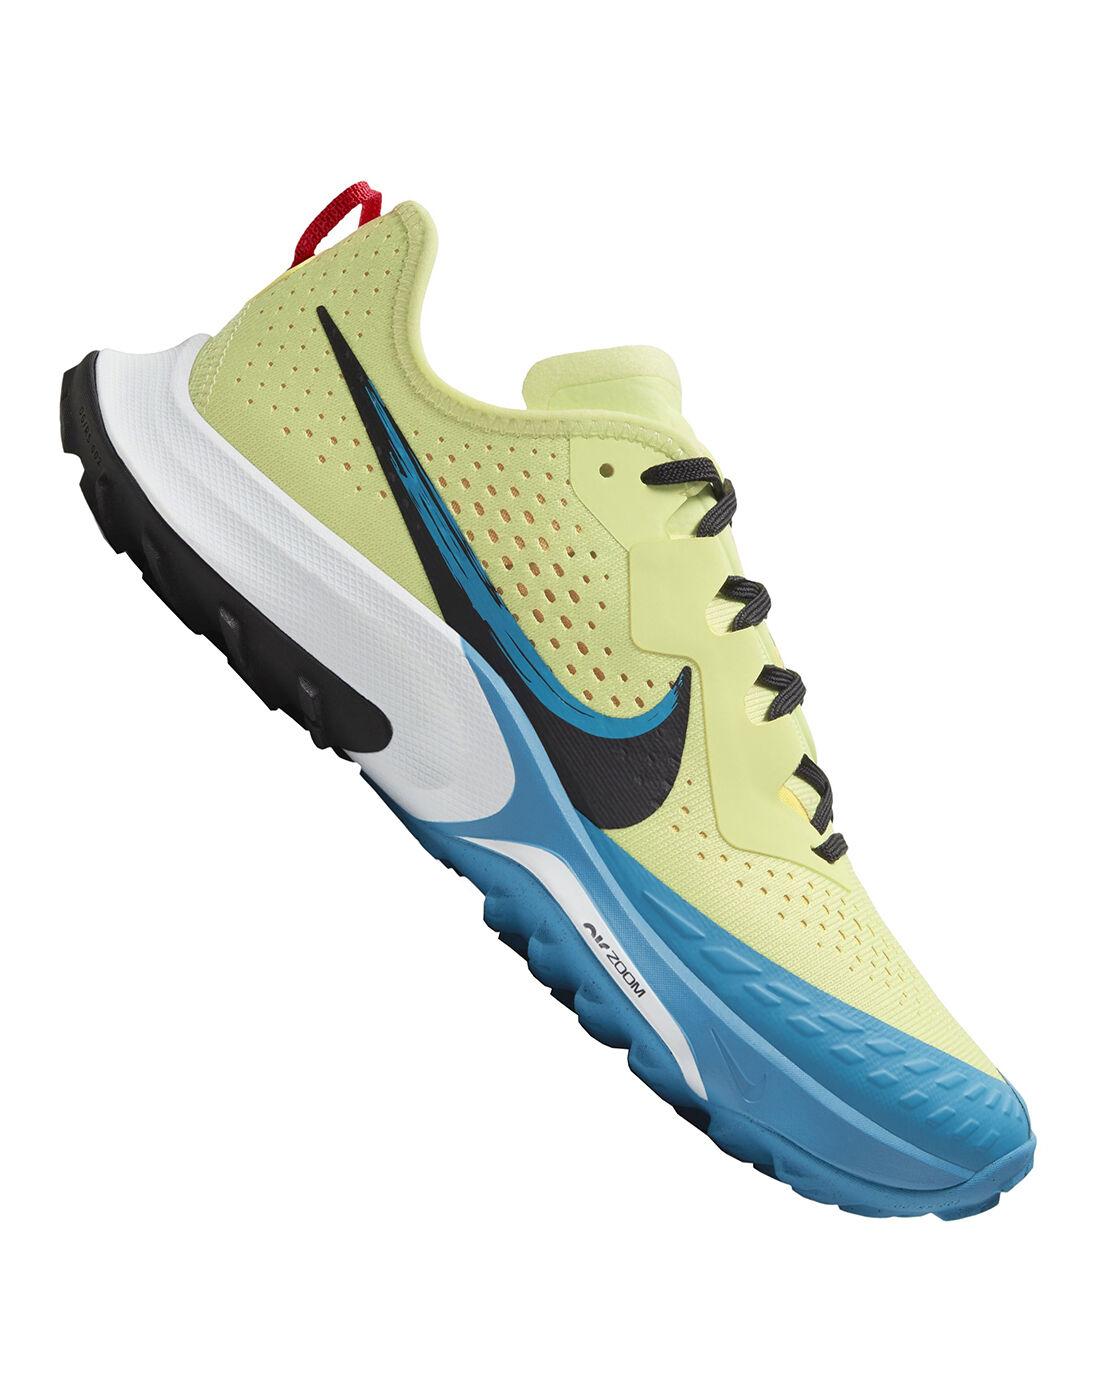 Nike adidas neo kids cloudfoam race shoe store shoes | Womens Zoom Terra Kiger 7